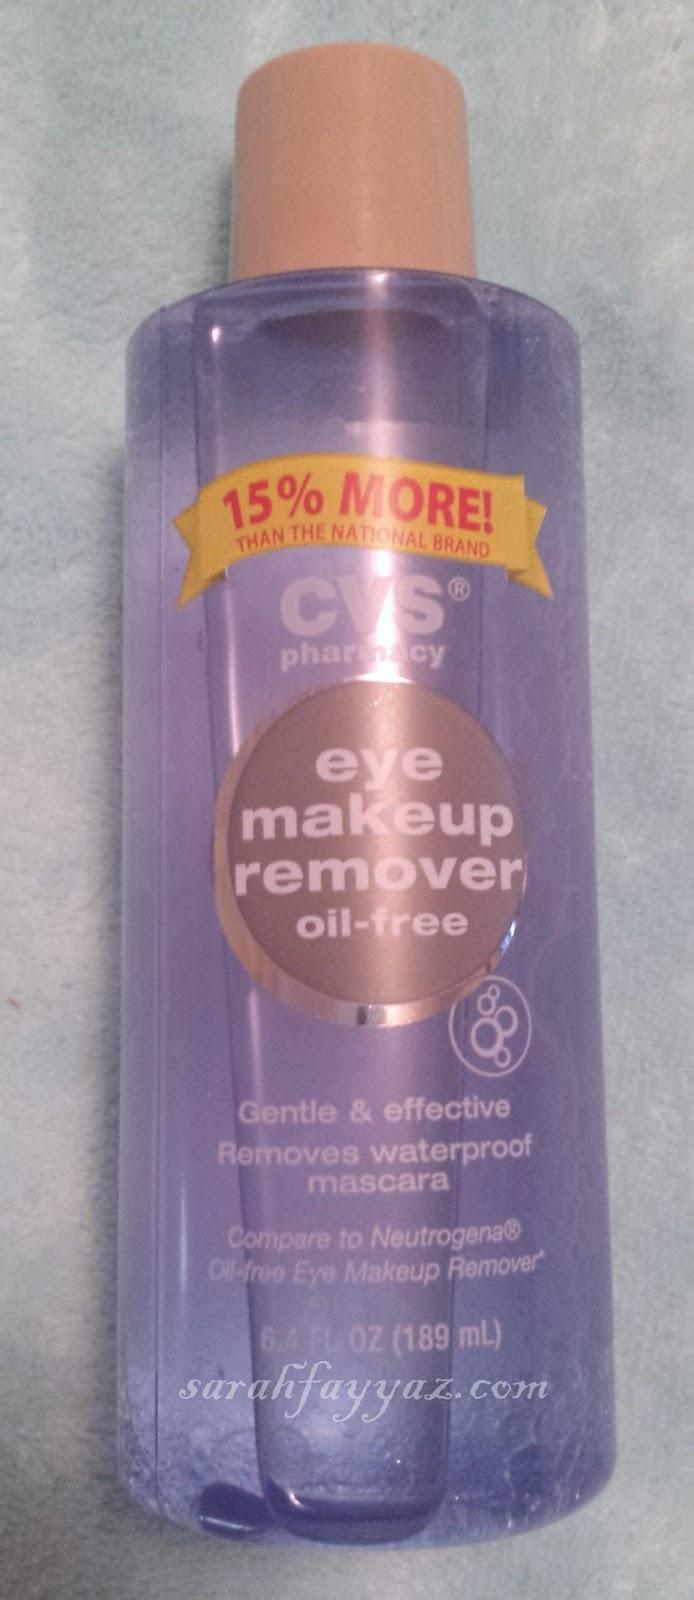 My favorite CVS brand Eye Makeup Remover (Iu0026#39;ve gone through multiples)